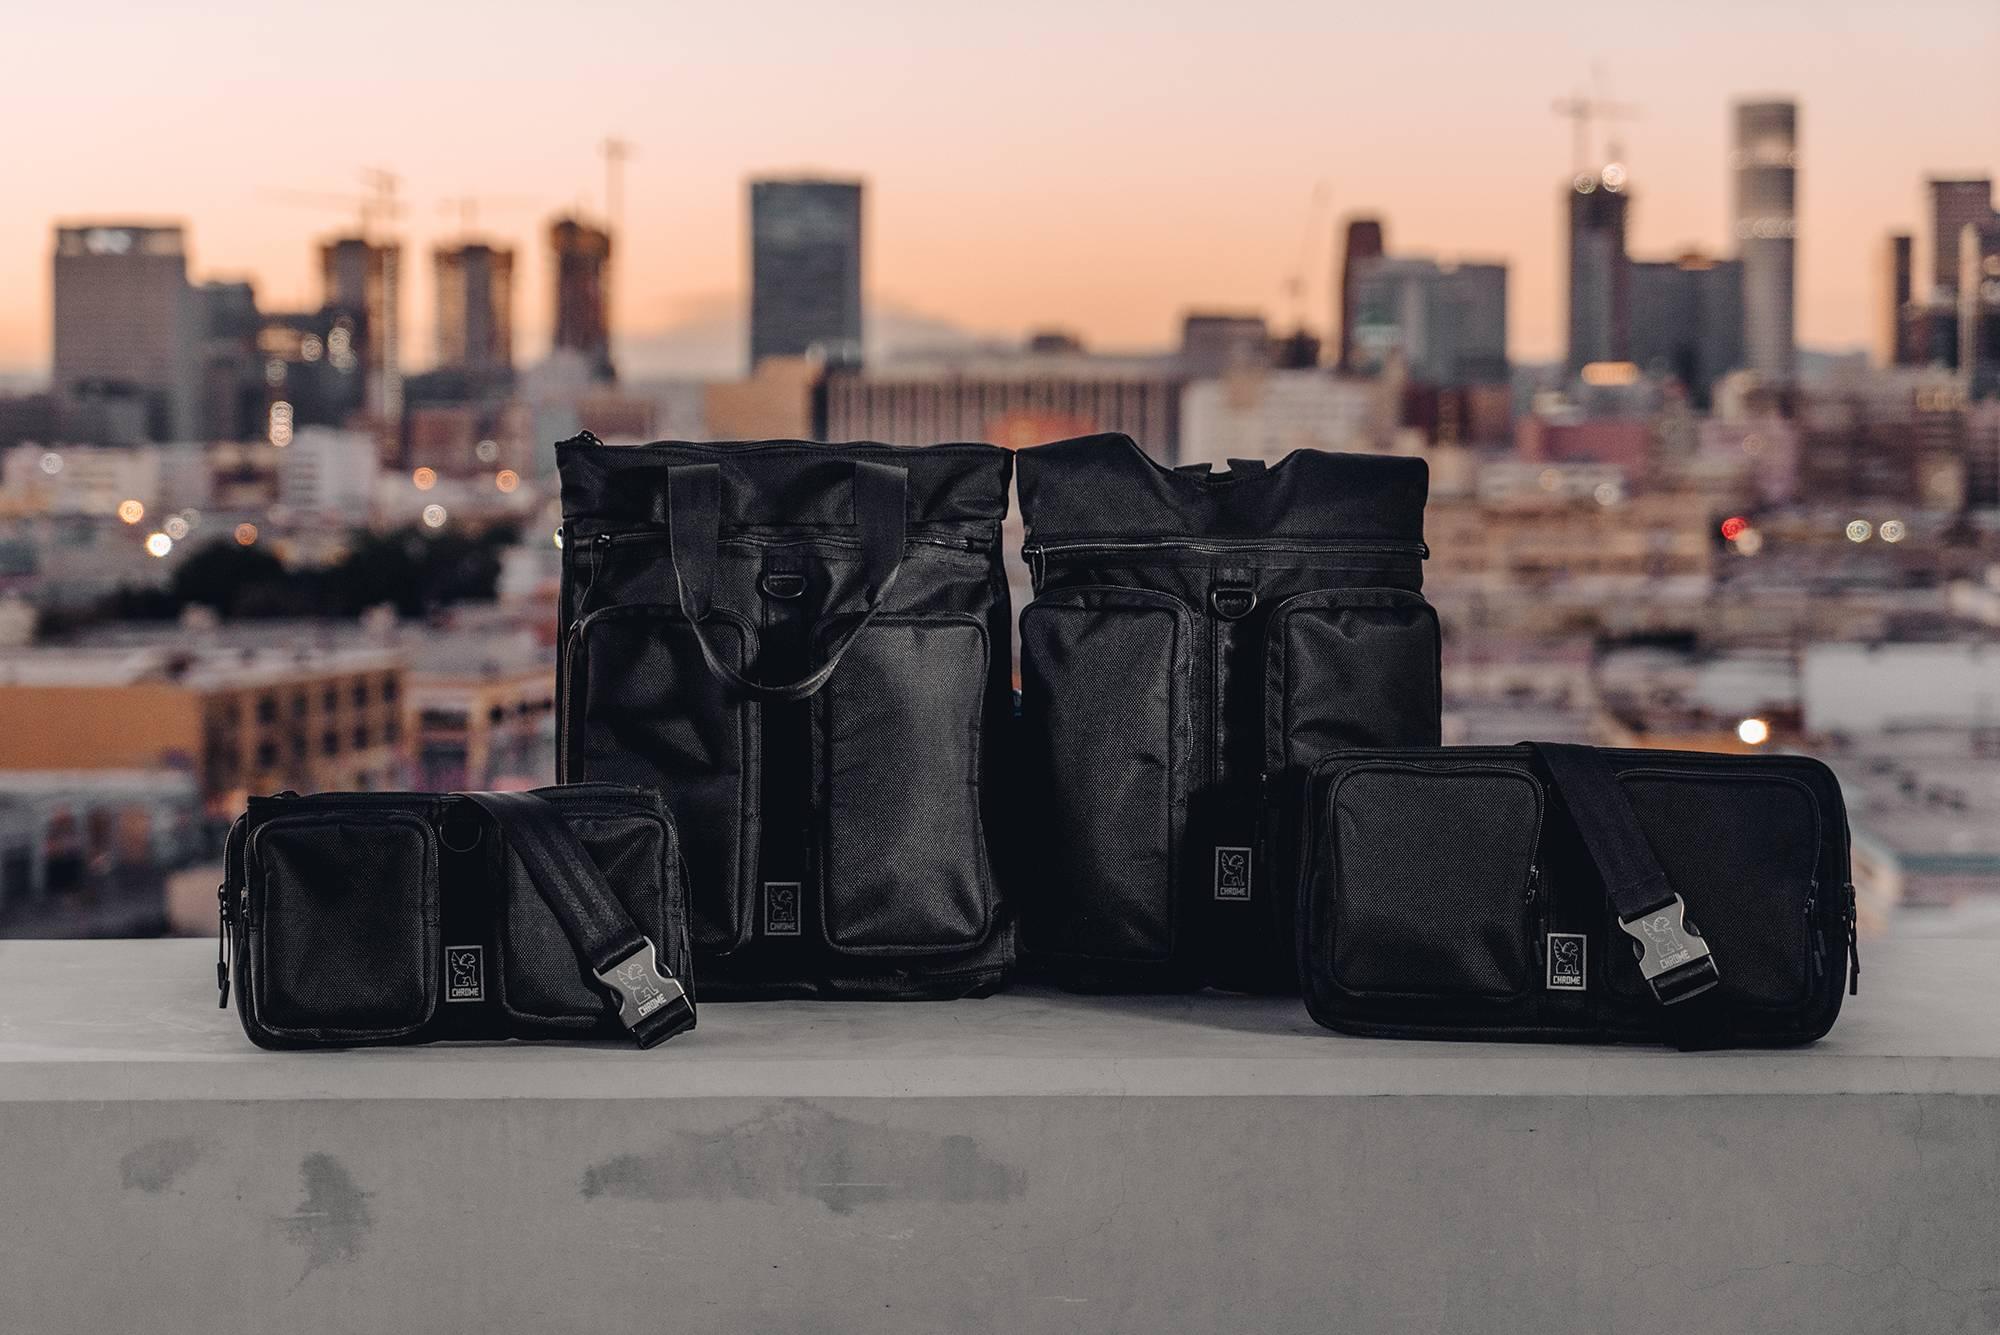 Chrome Industries以涩谷文化为灵感,打造全新都市骑行包袋系列